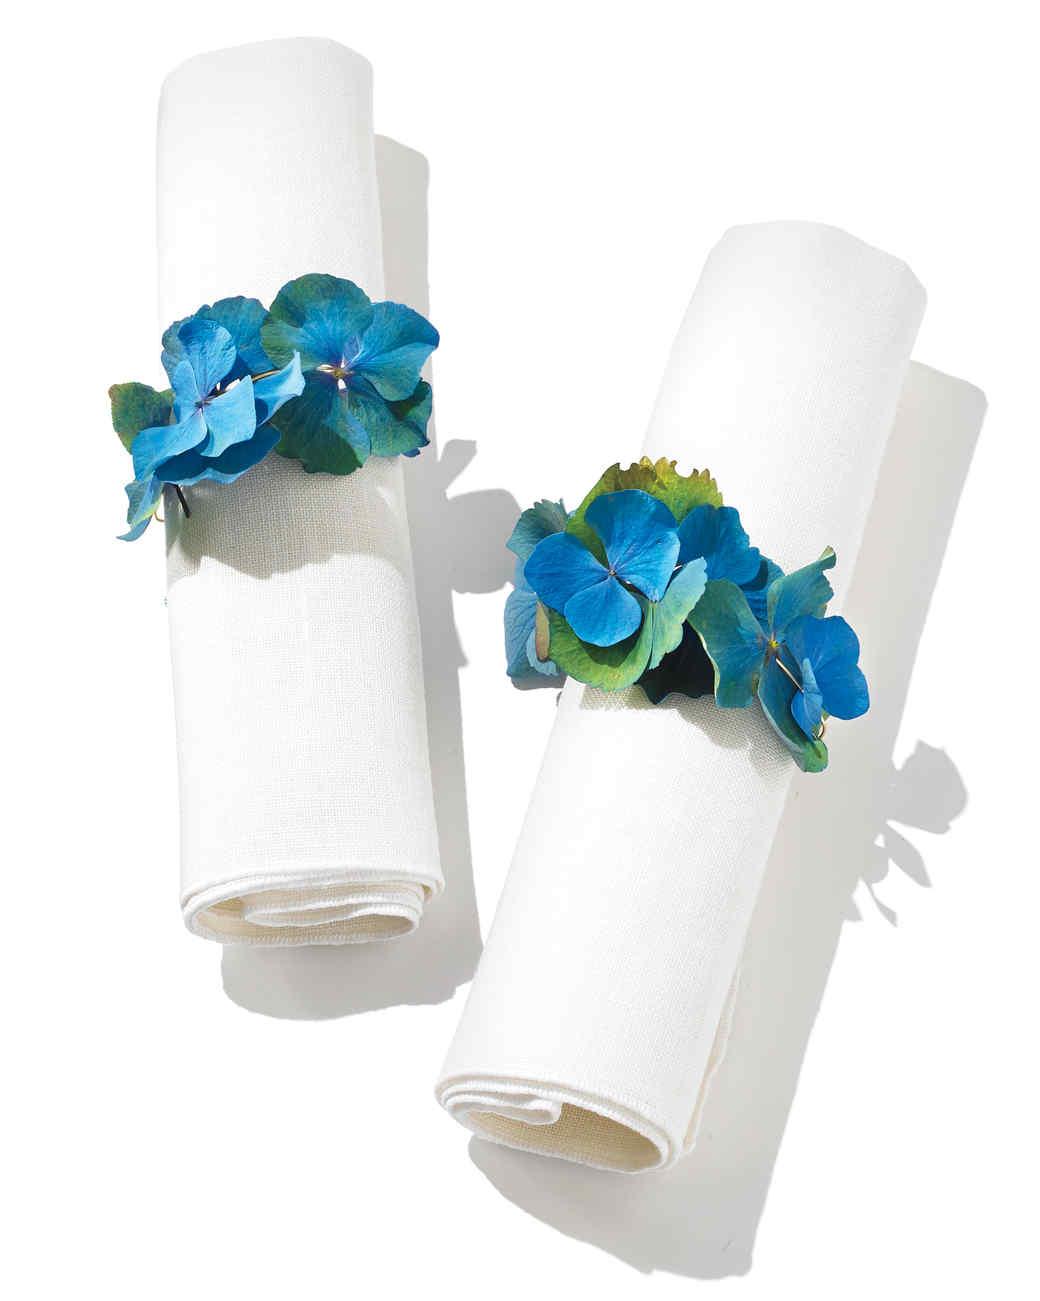 hydrangea-napkin-rings-157-d112023.jpg